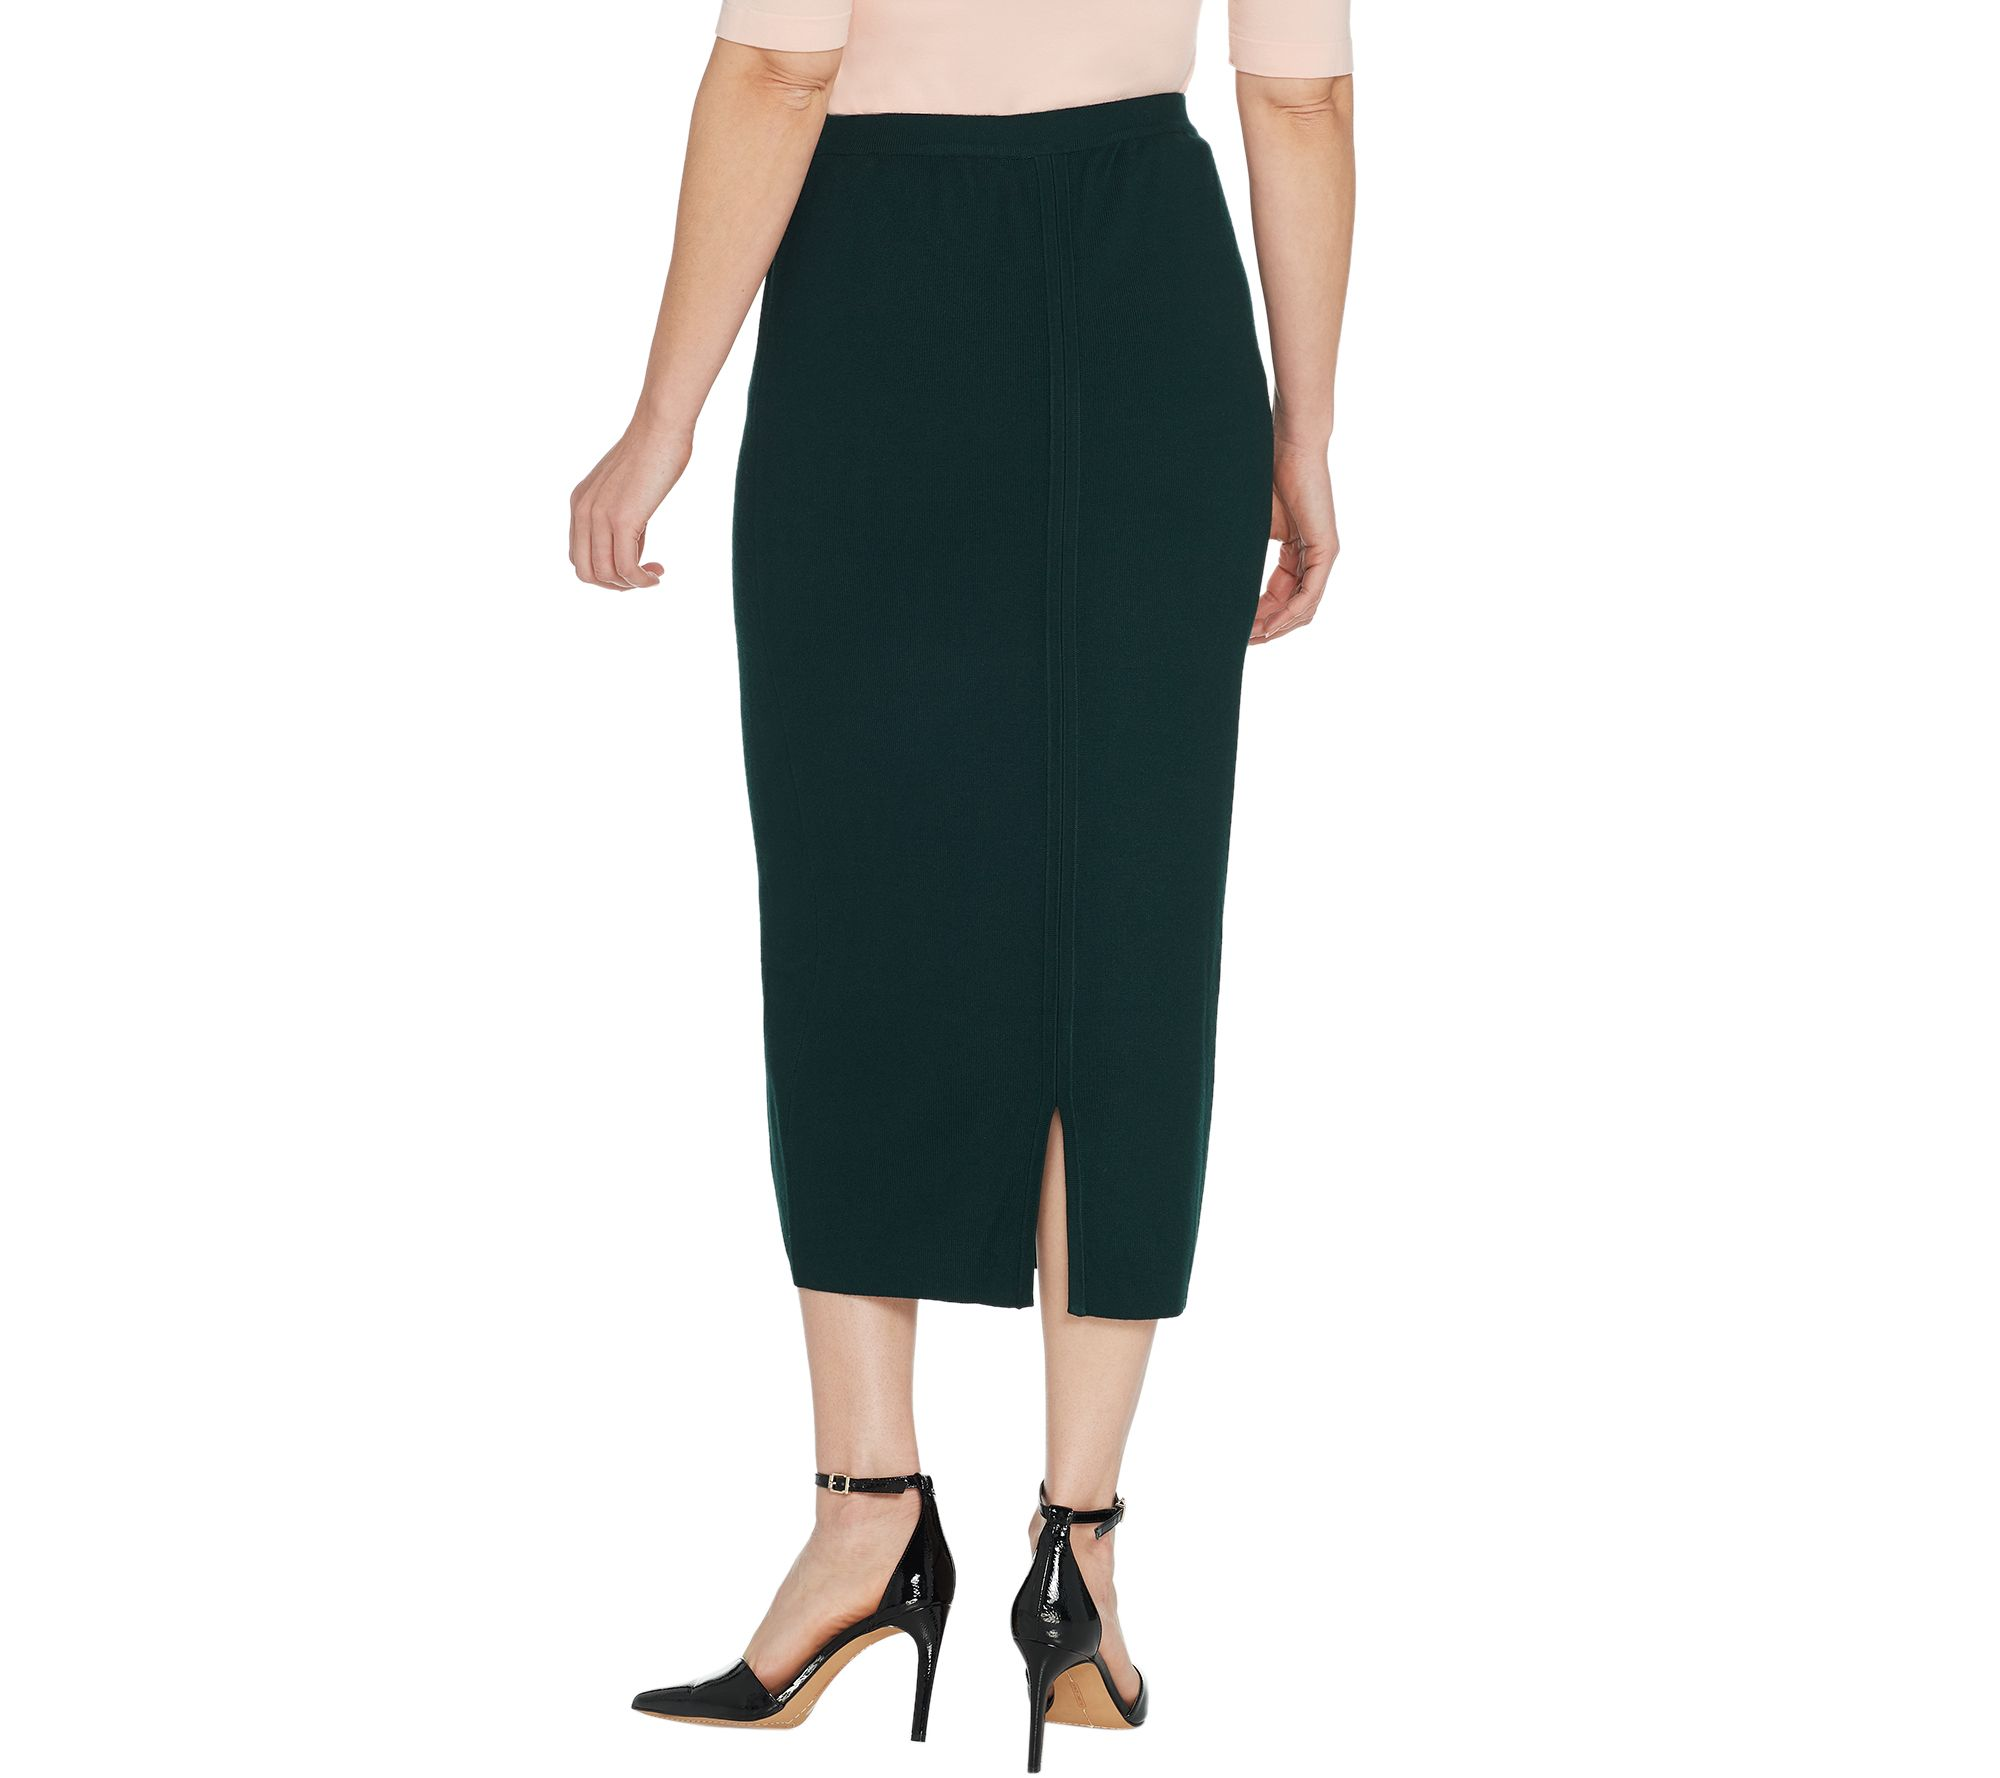 f83c675d0e Linea by Louis Dell'Olio Whisper Knit Midi Skirt - Page 1 — QVC.com